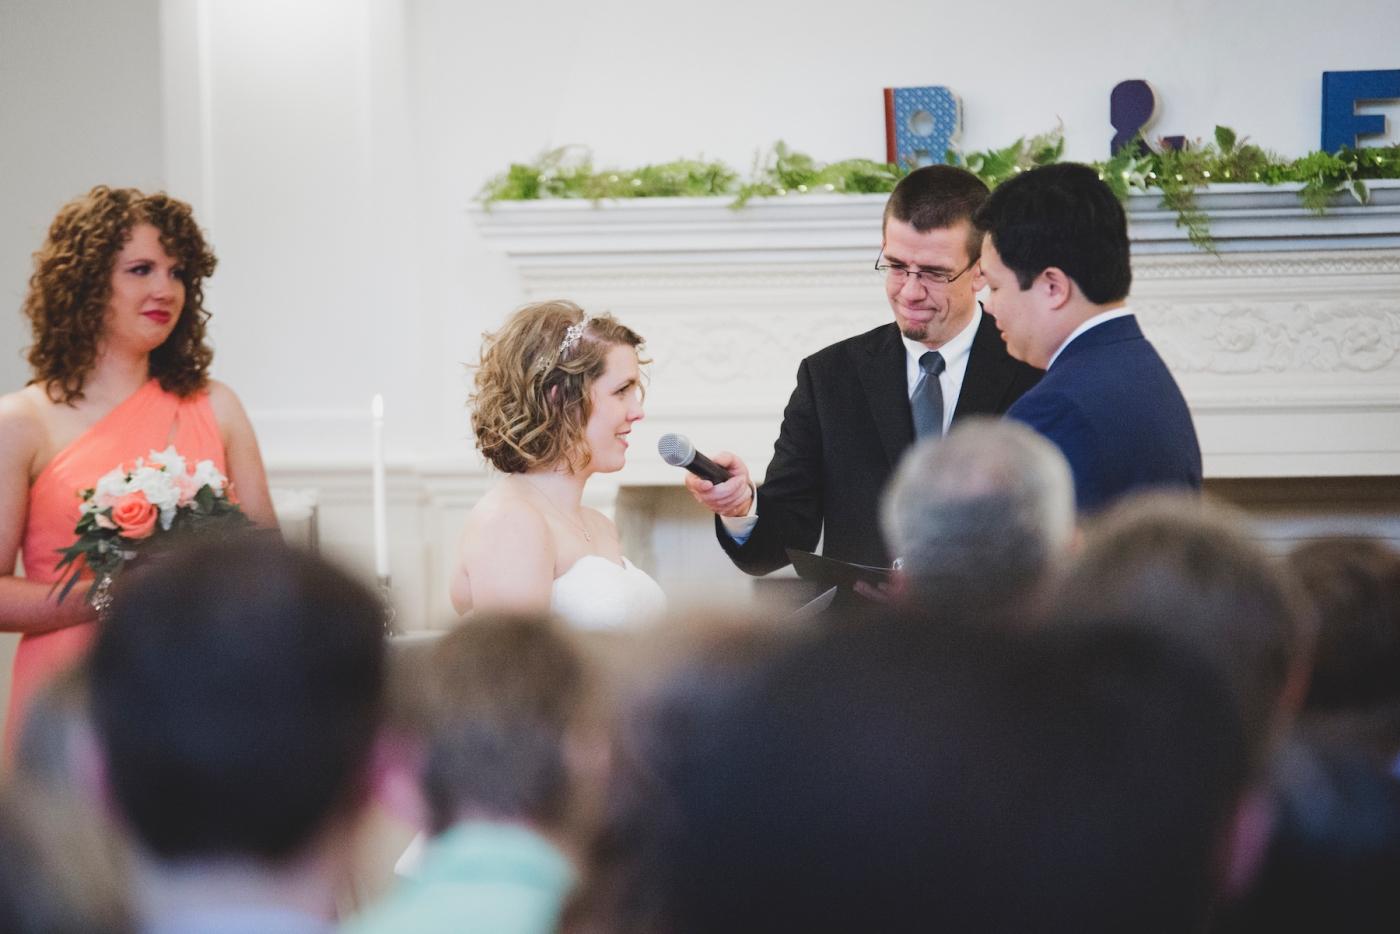 DSC_2676Everett_Wedding_Ballroom_Jane_Speleers_photography_Rachel_and_Edmund_Ceremony_2017